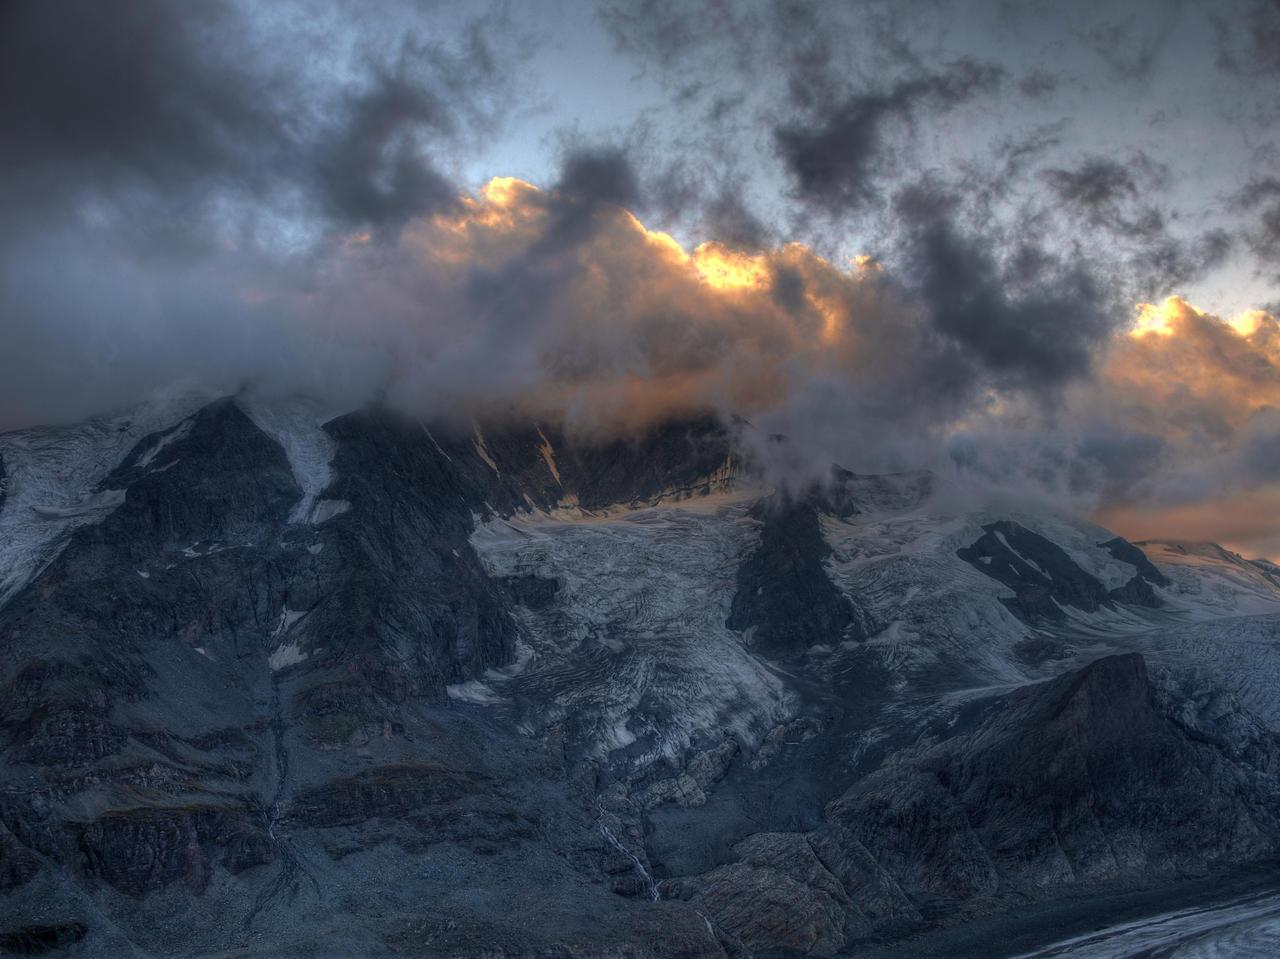 Glowing Alps by Burtn